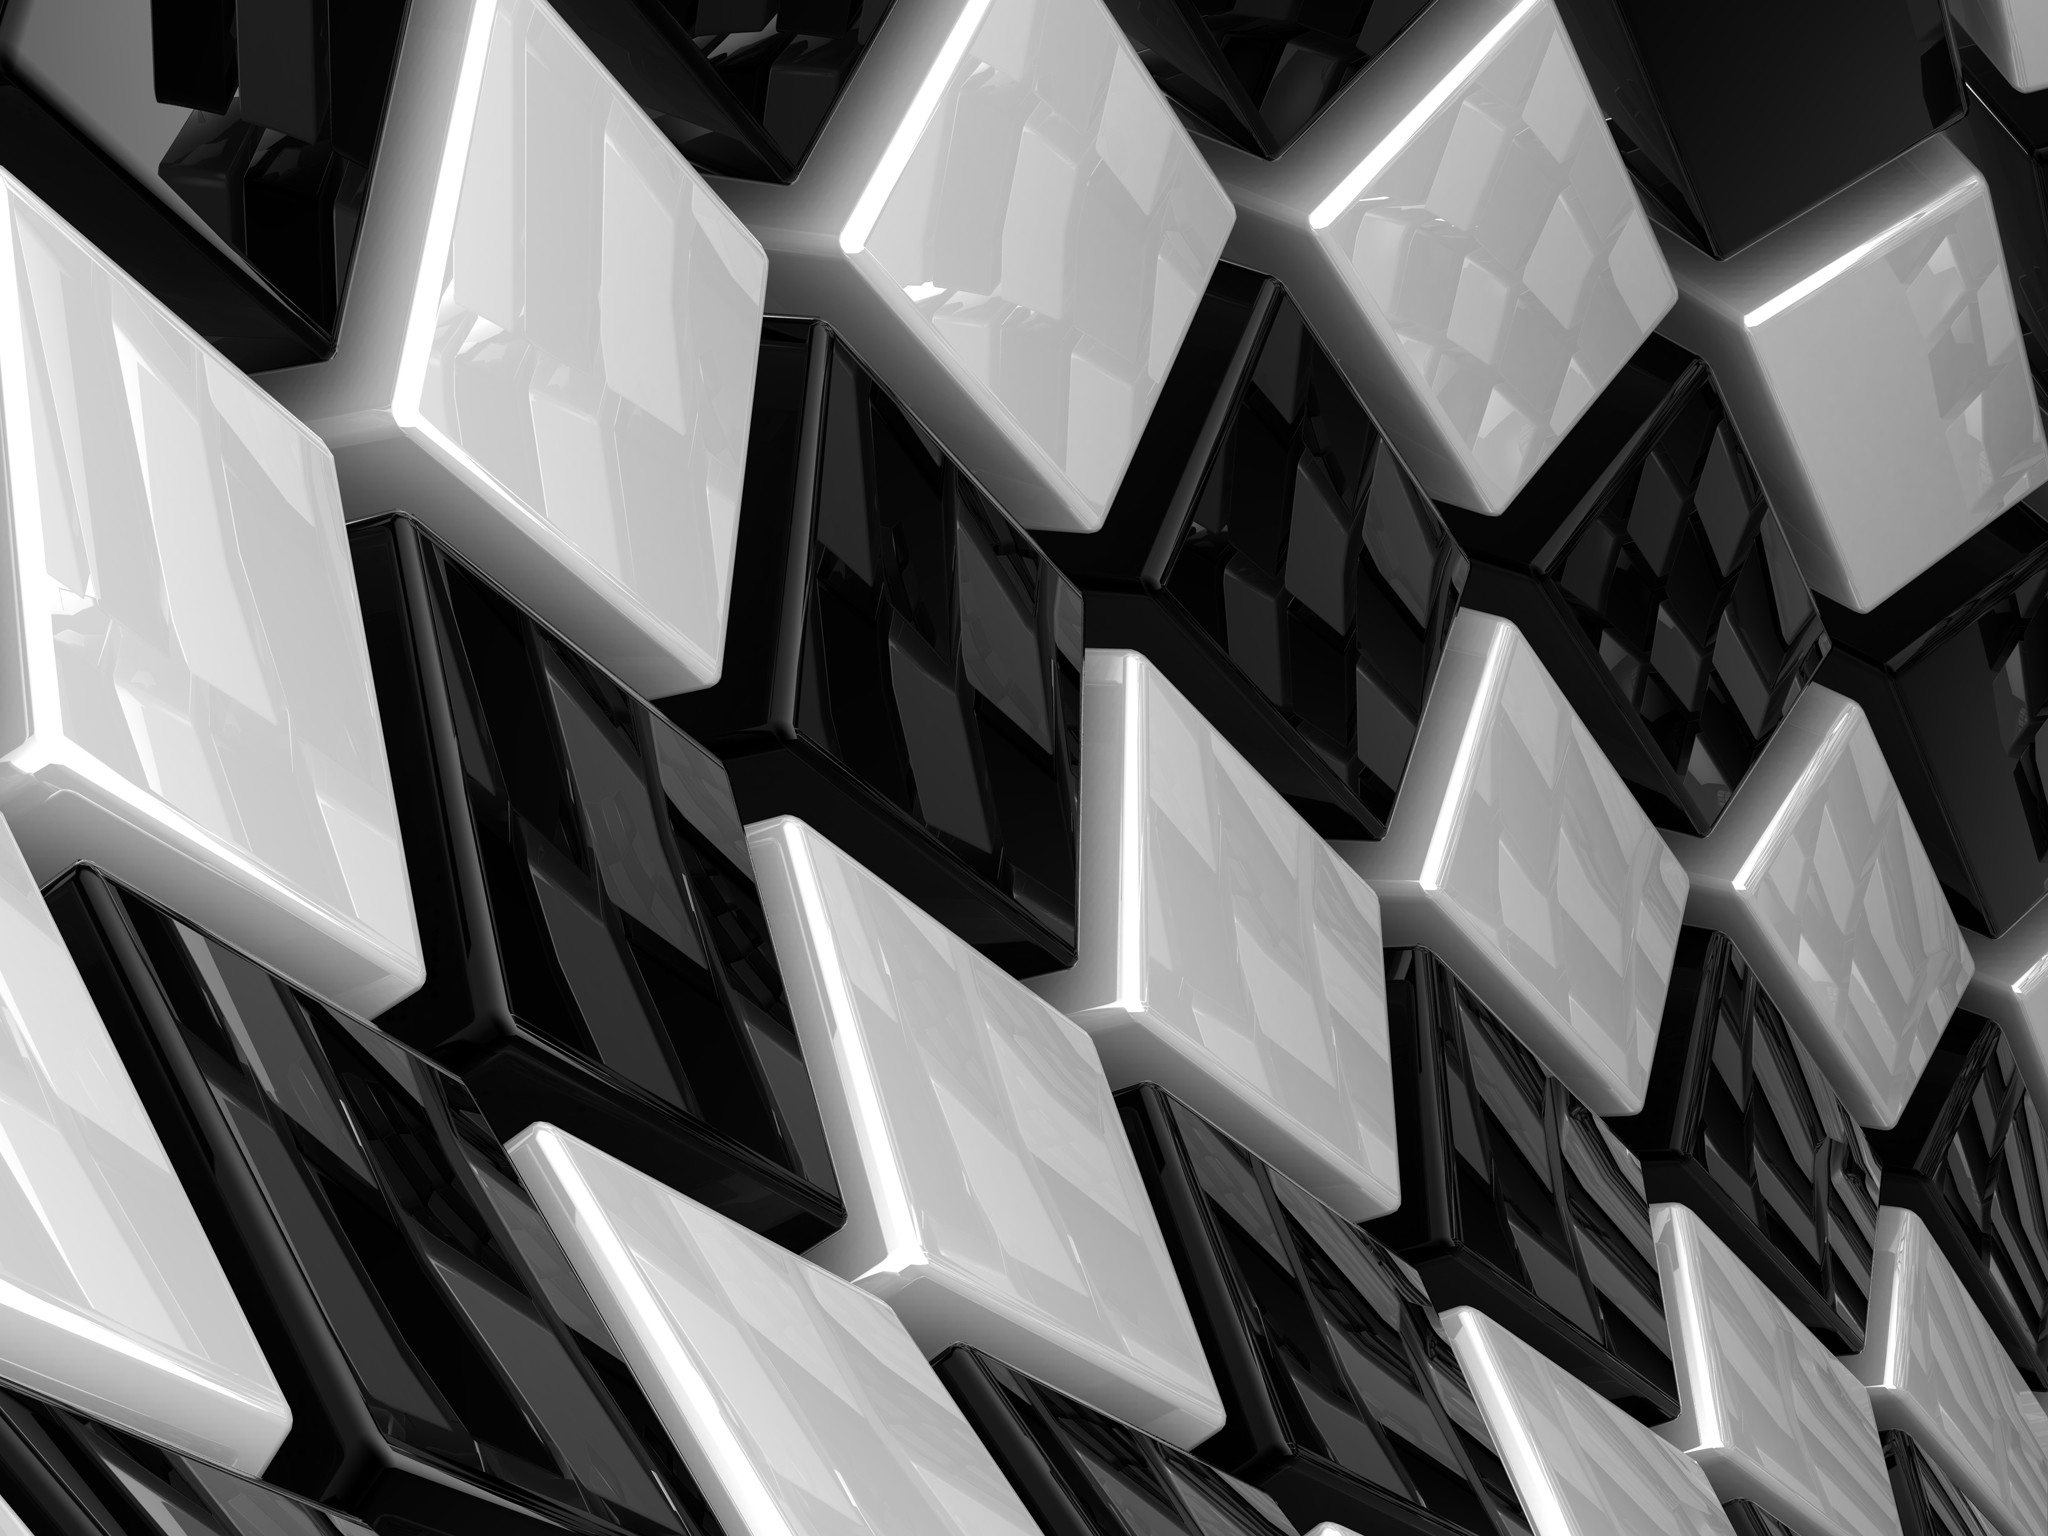 Black White Checkered Wallpaper (80+ images)